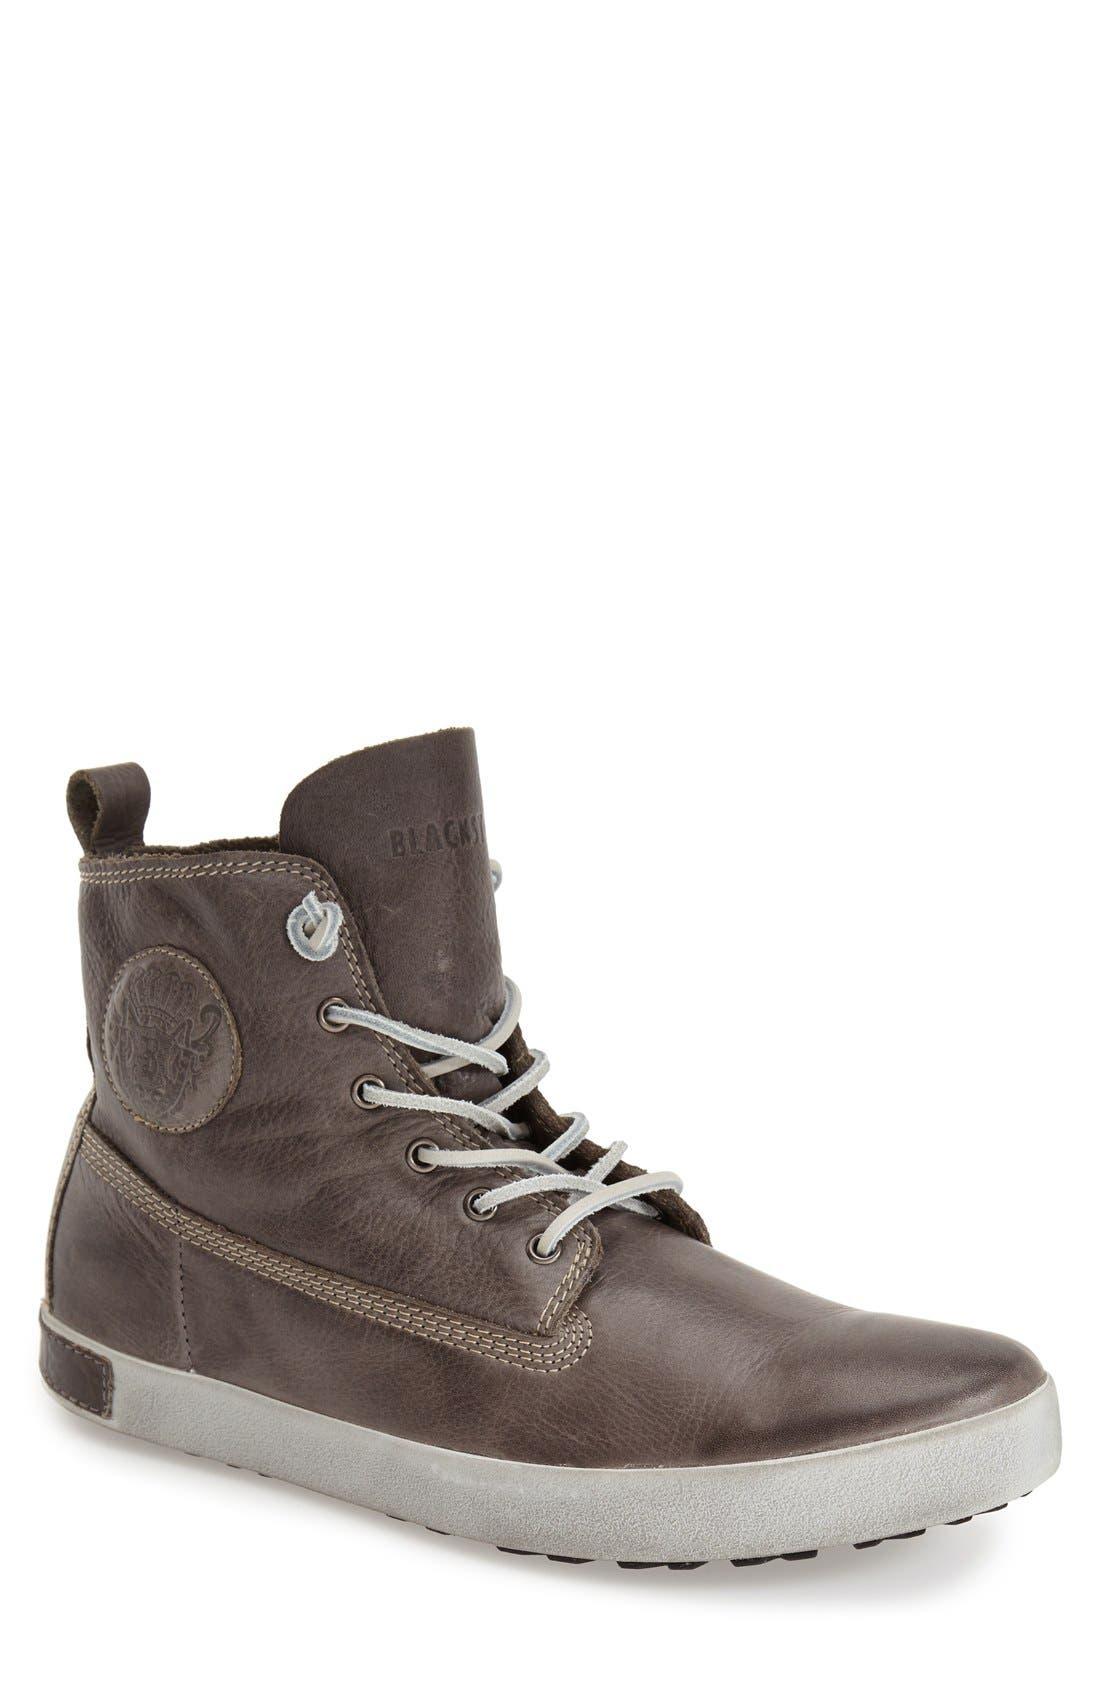 Alternate Image 1 Selected - Blackstone 'JM04' Sneaker (Men)